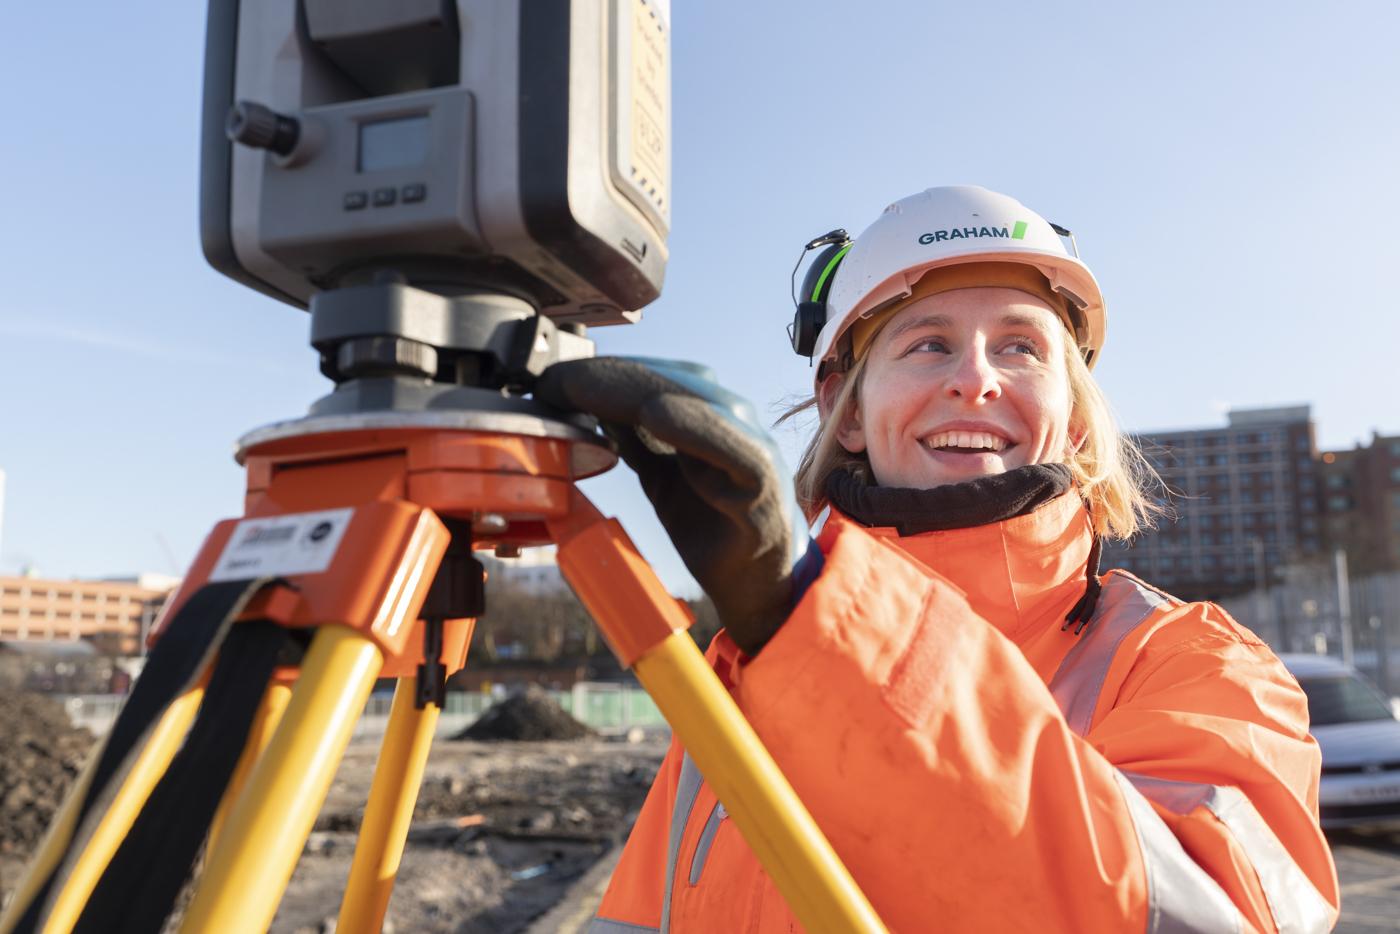 GRAHAM welcomes new intake of civil engineering graduates image